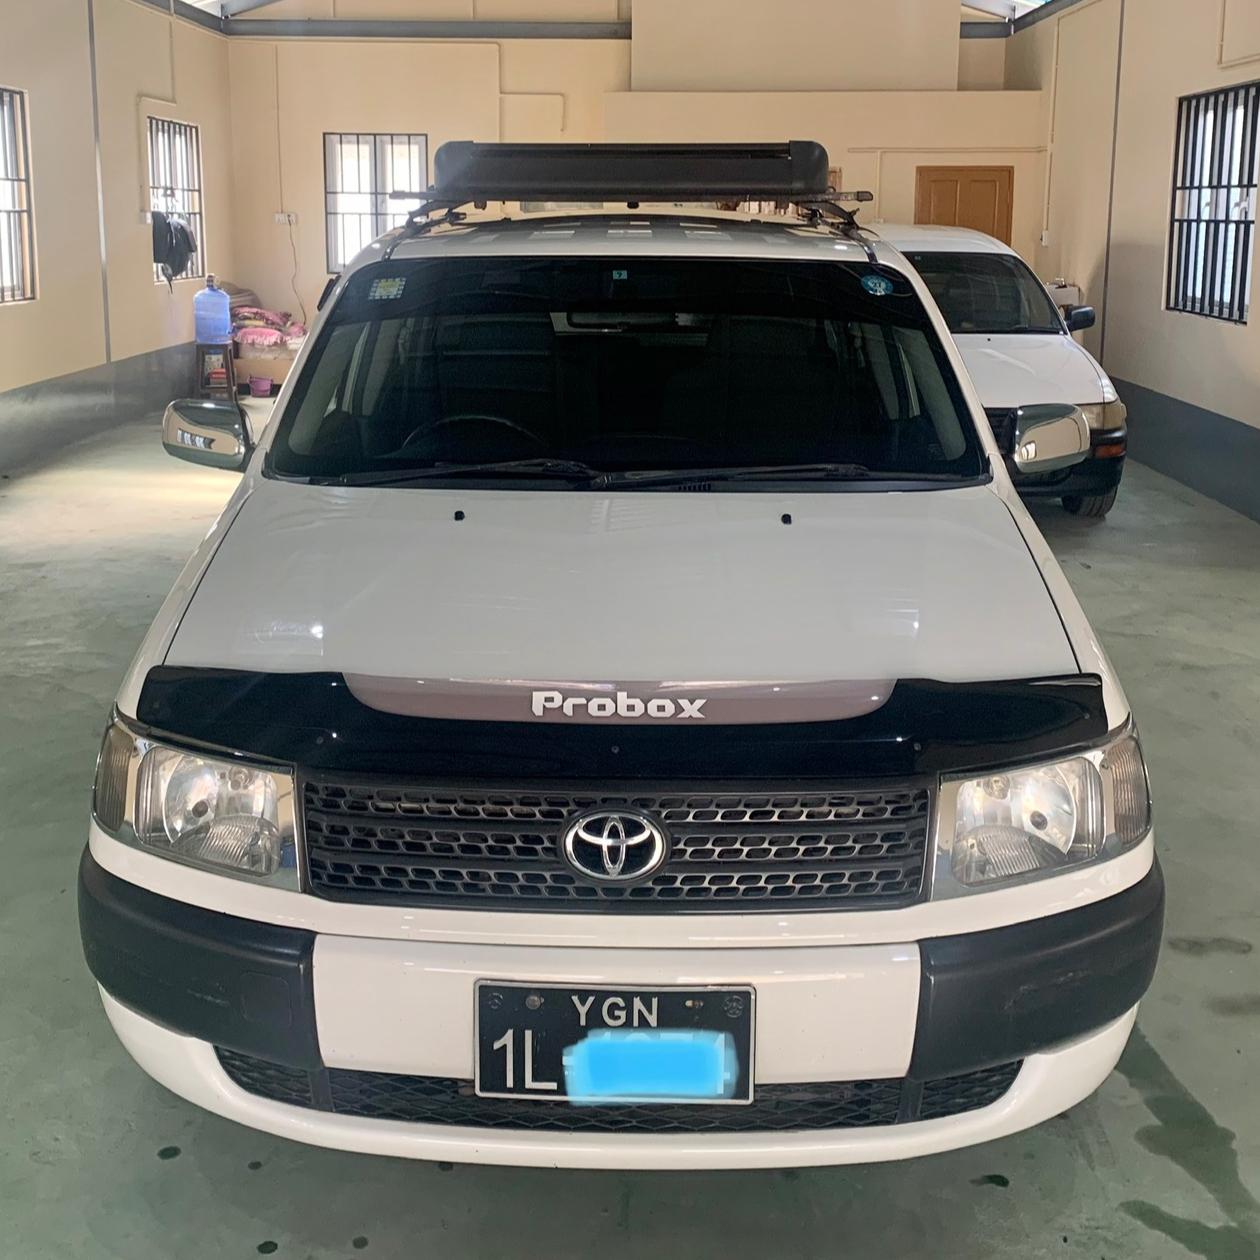 Toyota Probox 2010  Image, ဗန် classified, Myanmar marketplace, Myanmarkt